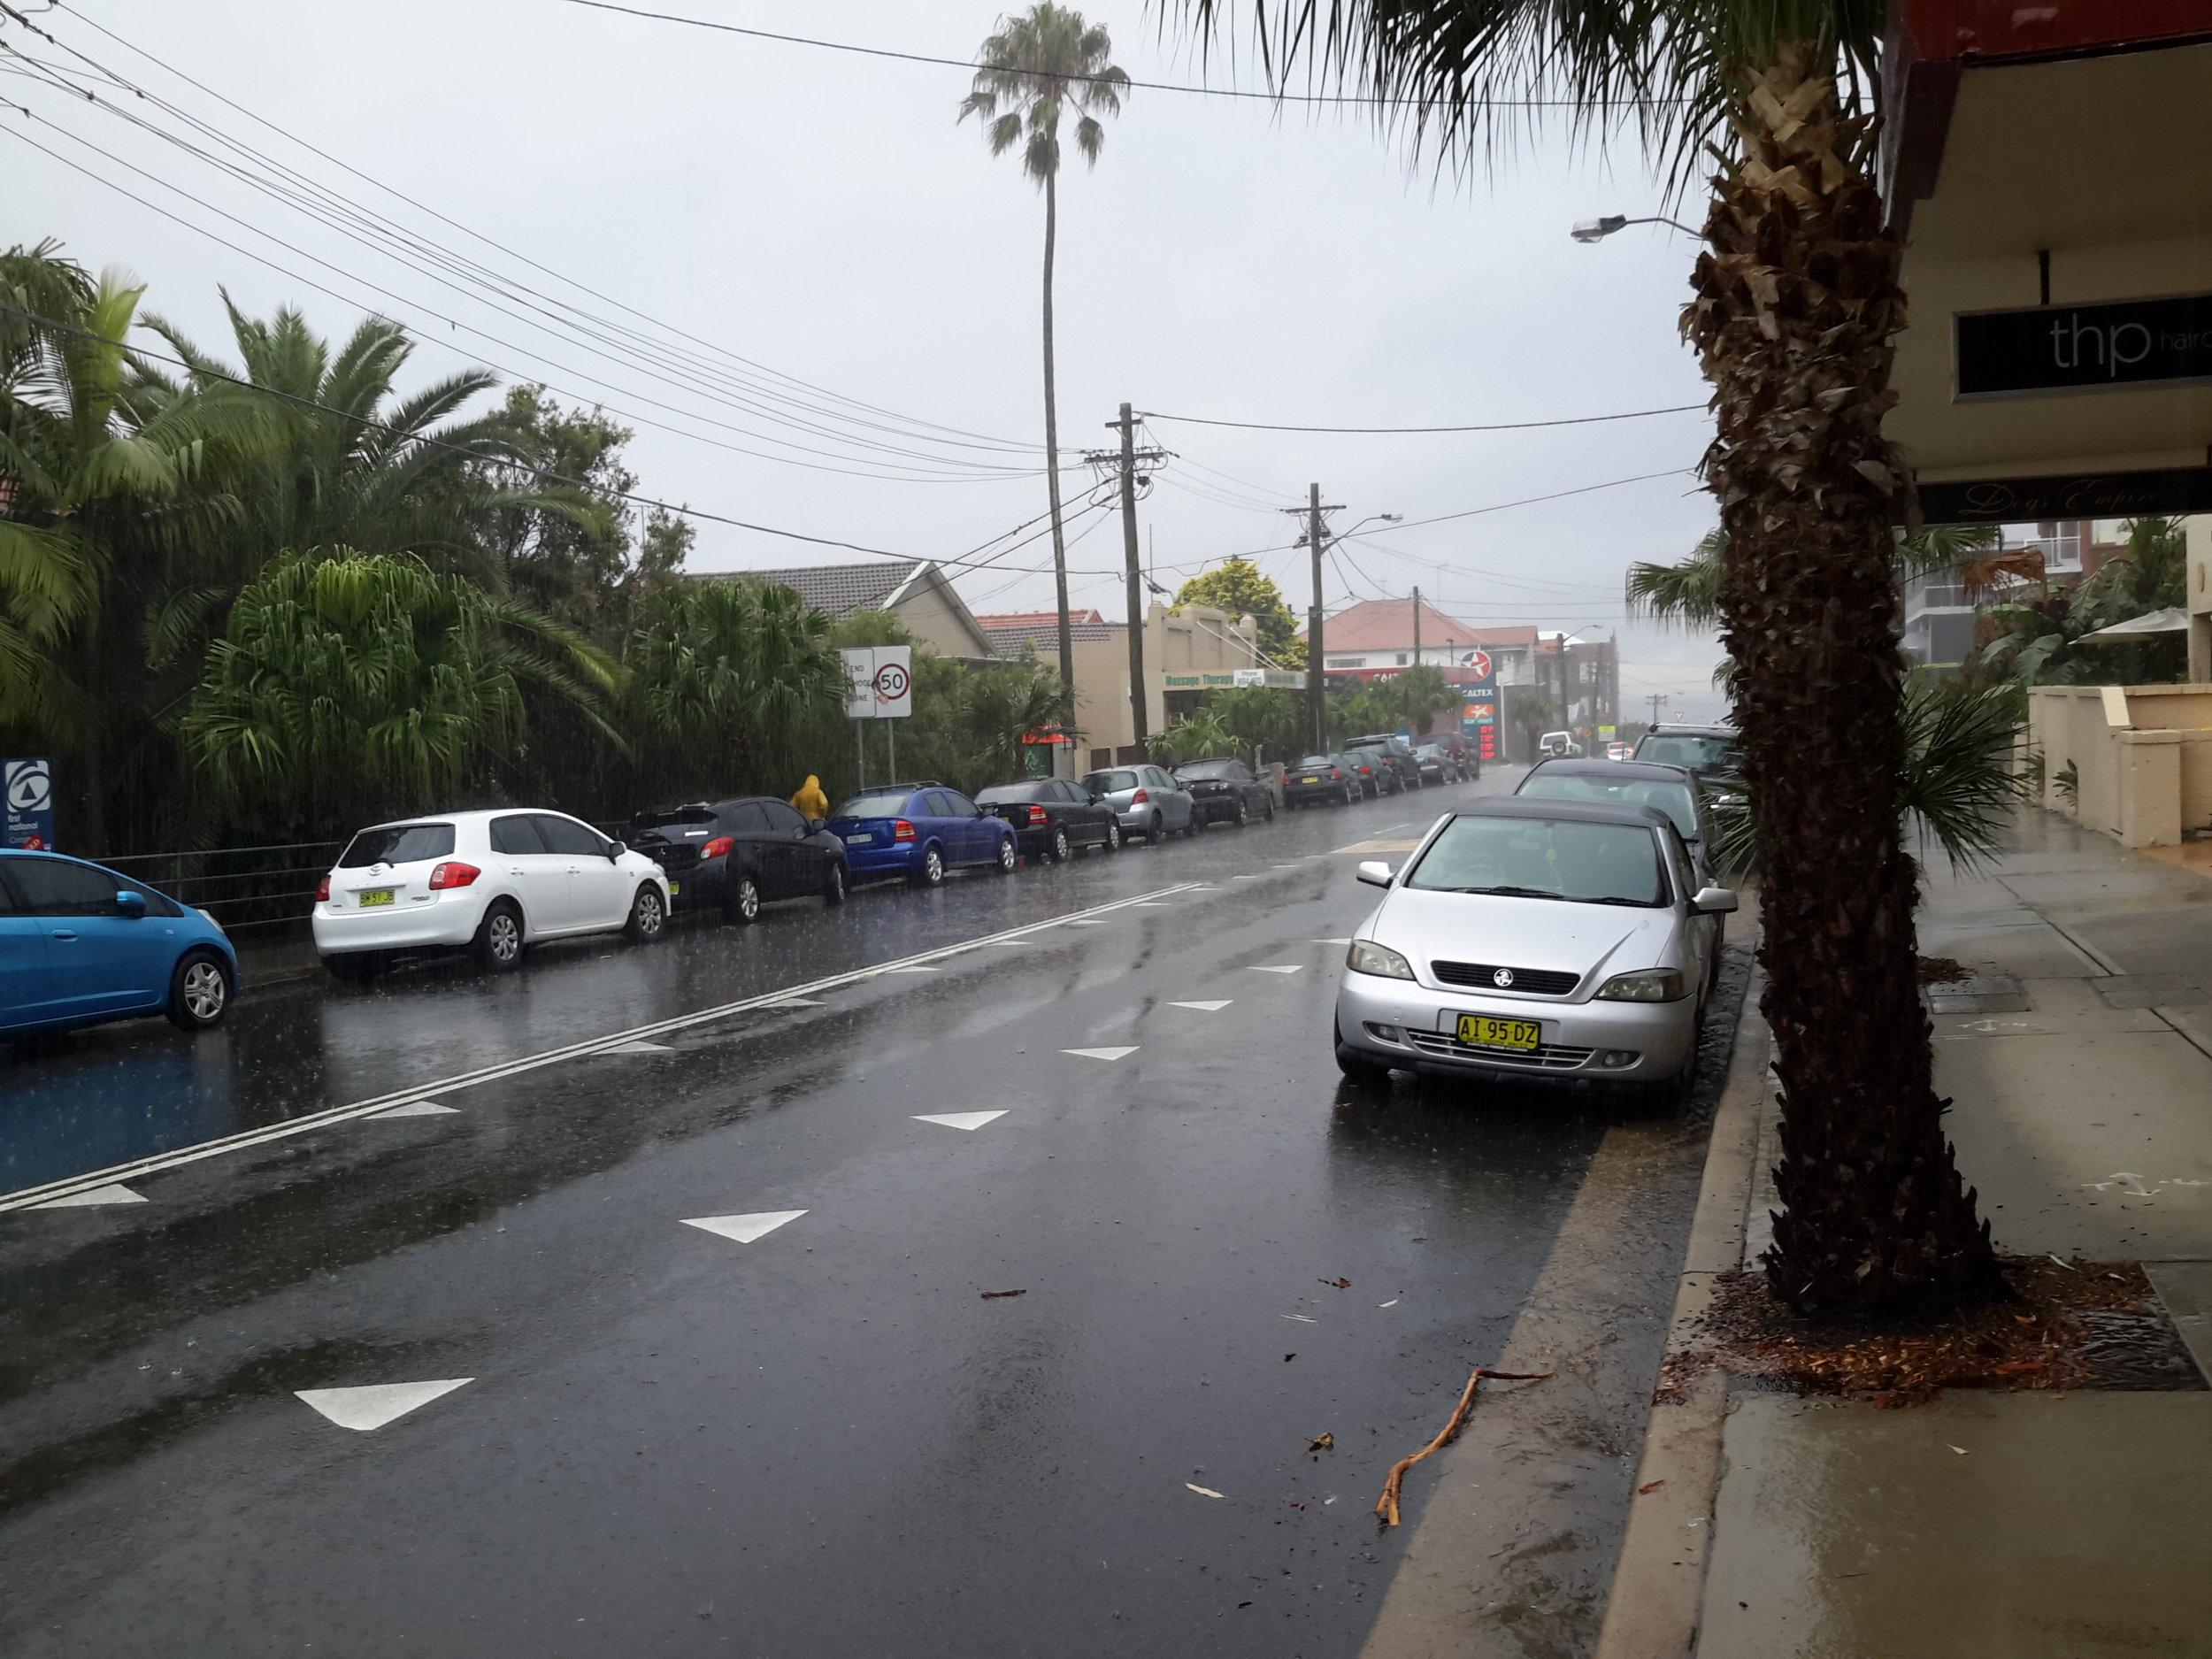 A rainy day in the neighbourhood